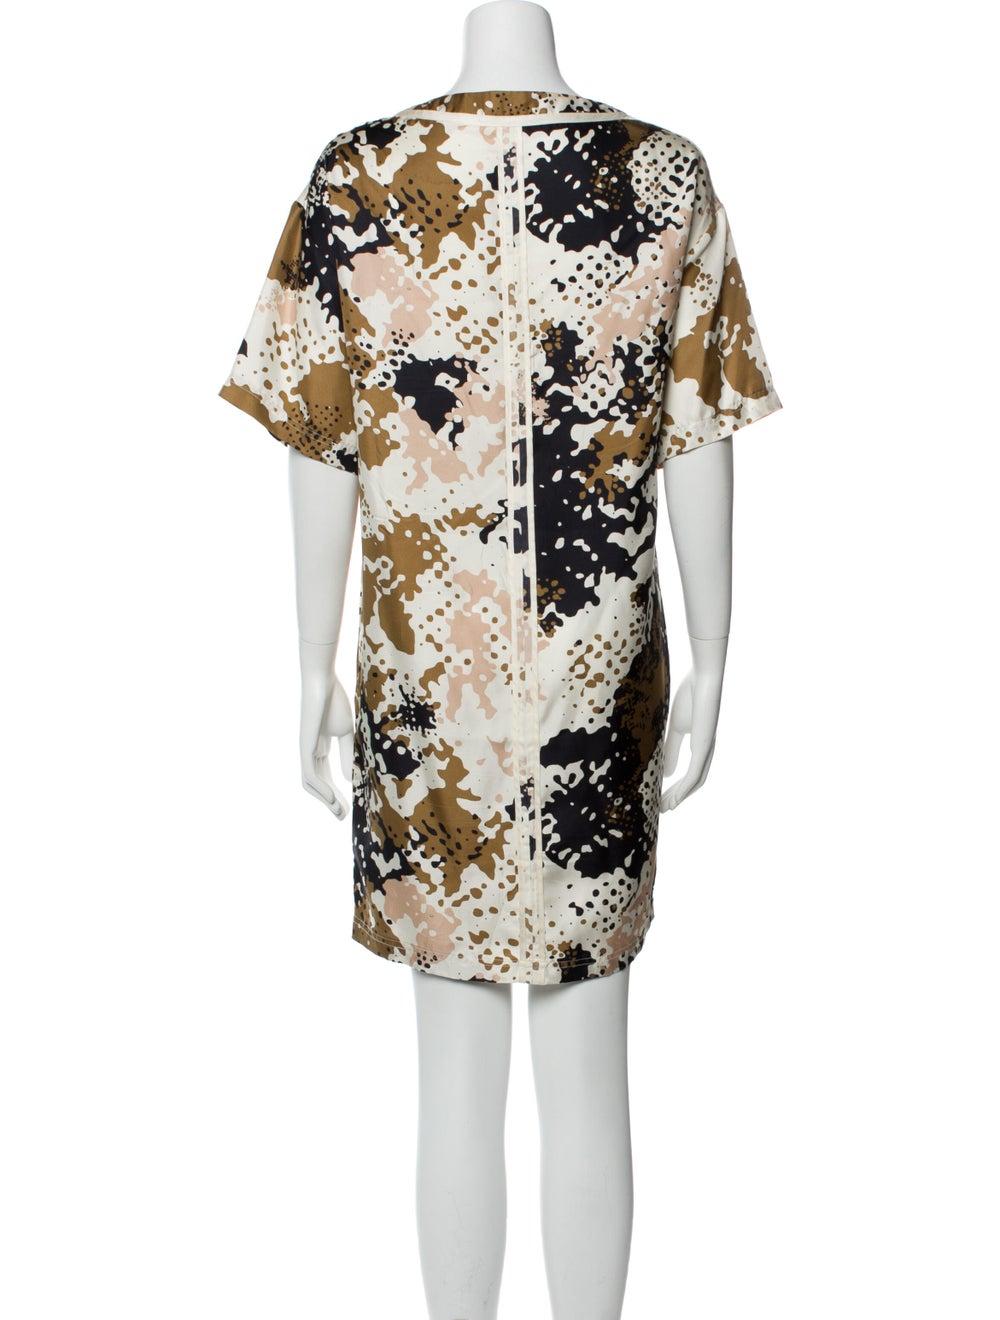 Rag & Bone Silk Mini Dress - image 3